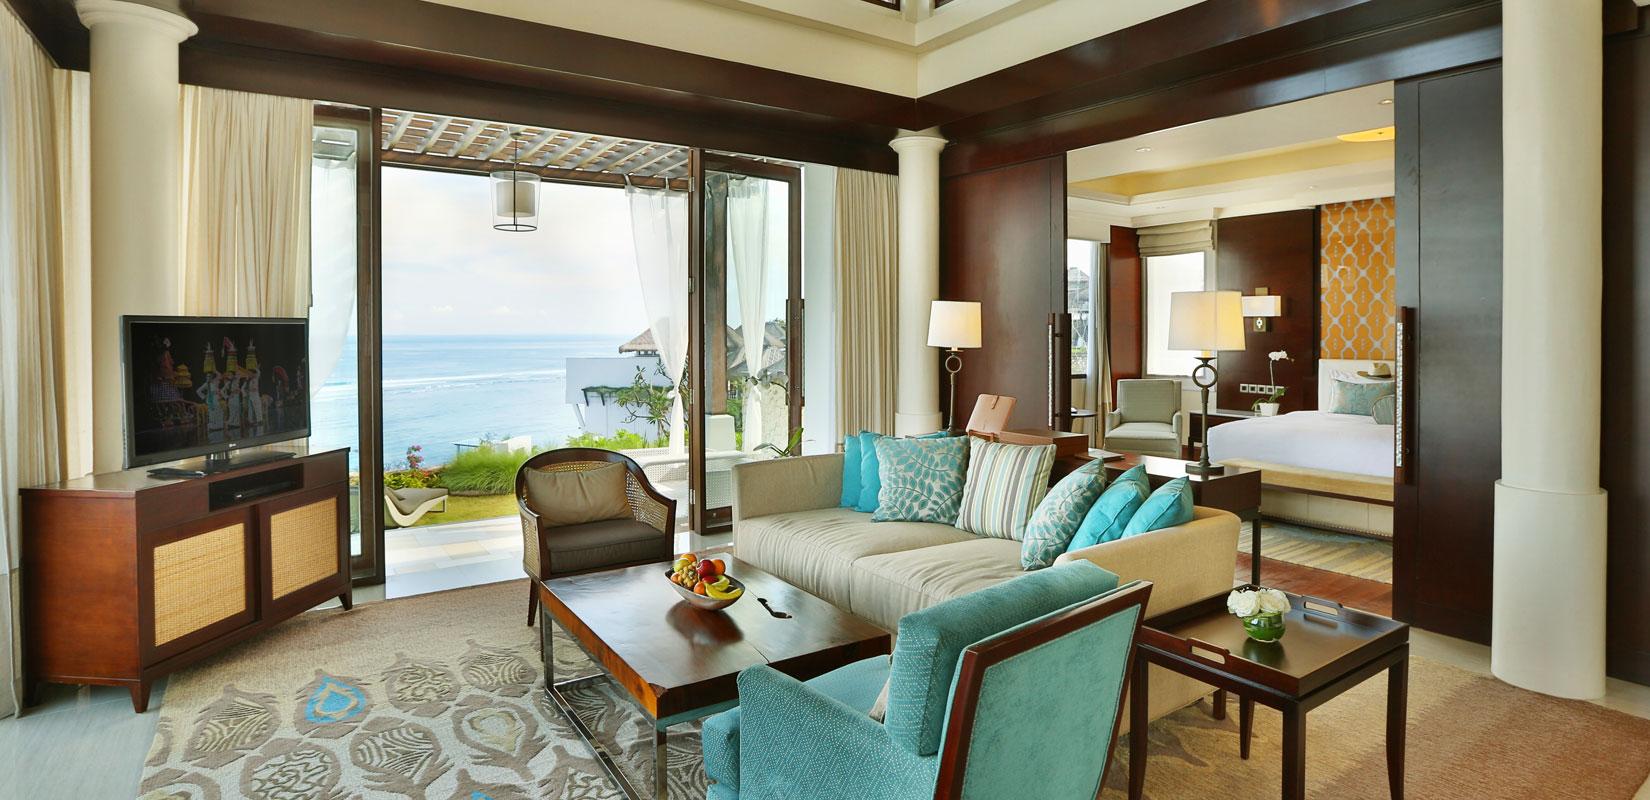 Samabe Bali Suites Villas One Bedroom Ocean View Suite